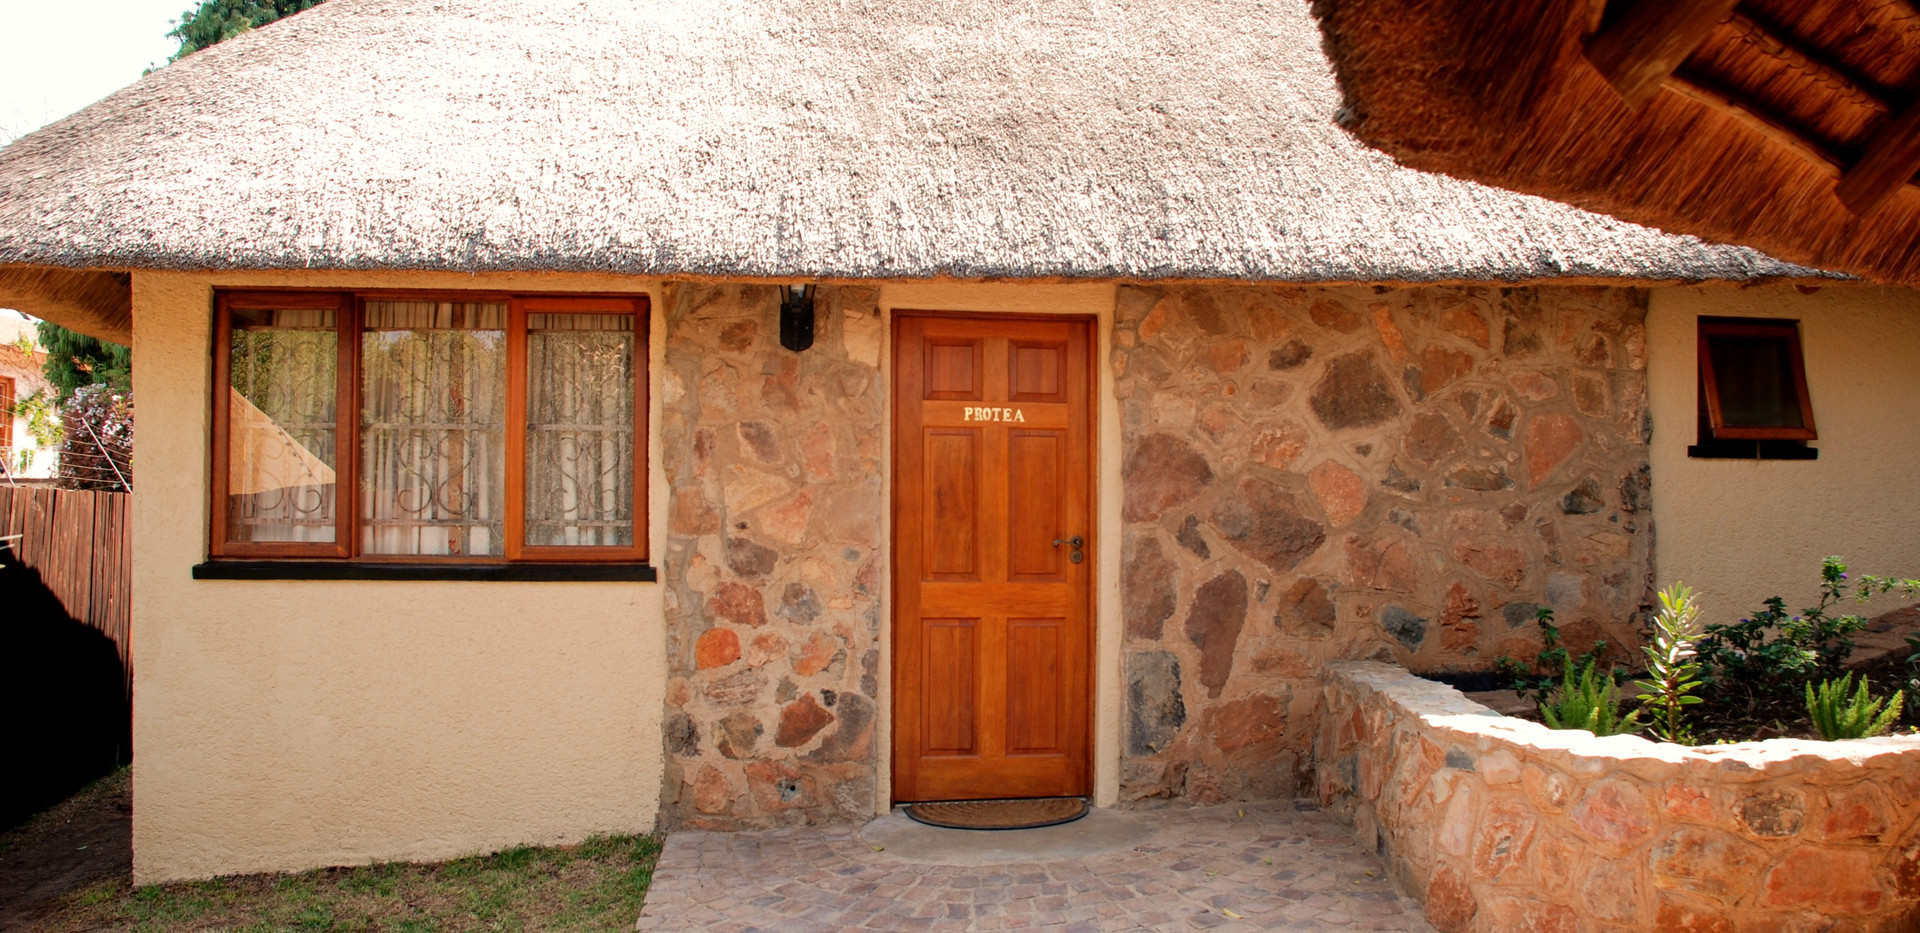 Protea apartment exterior